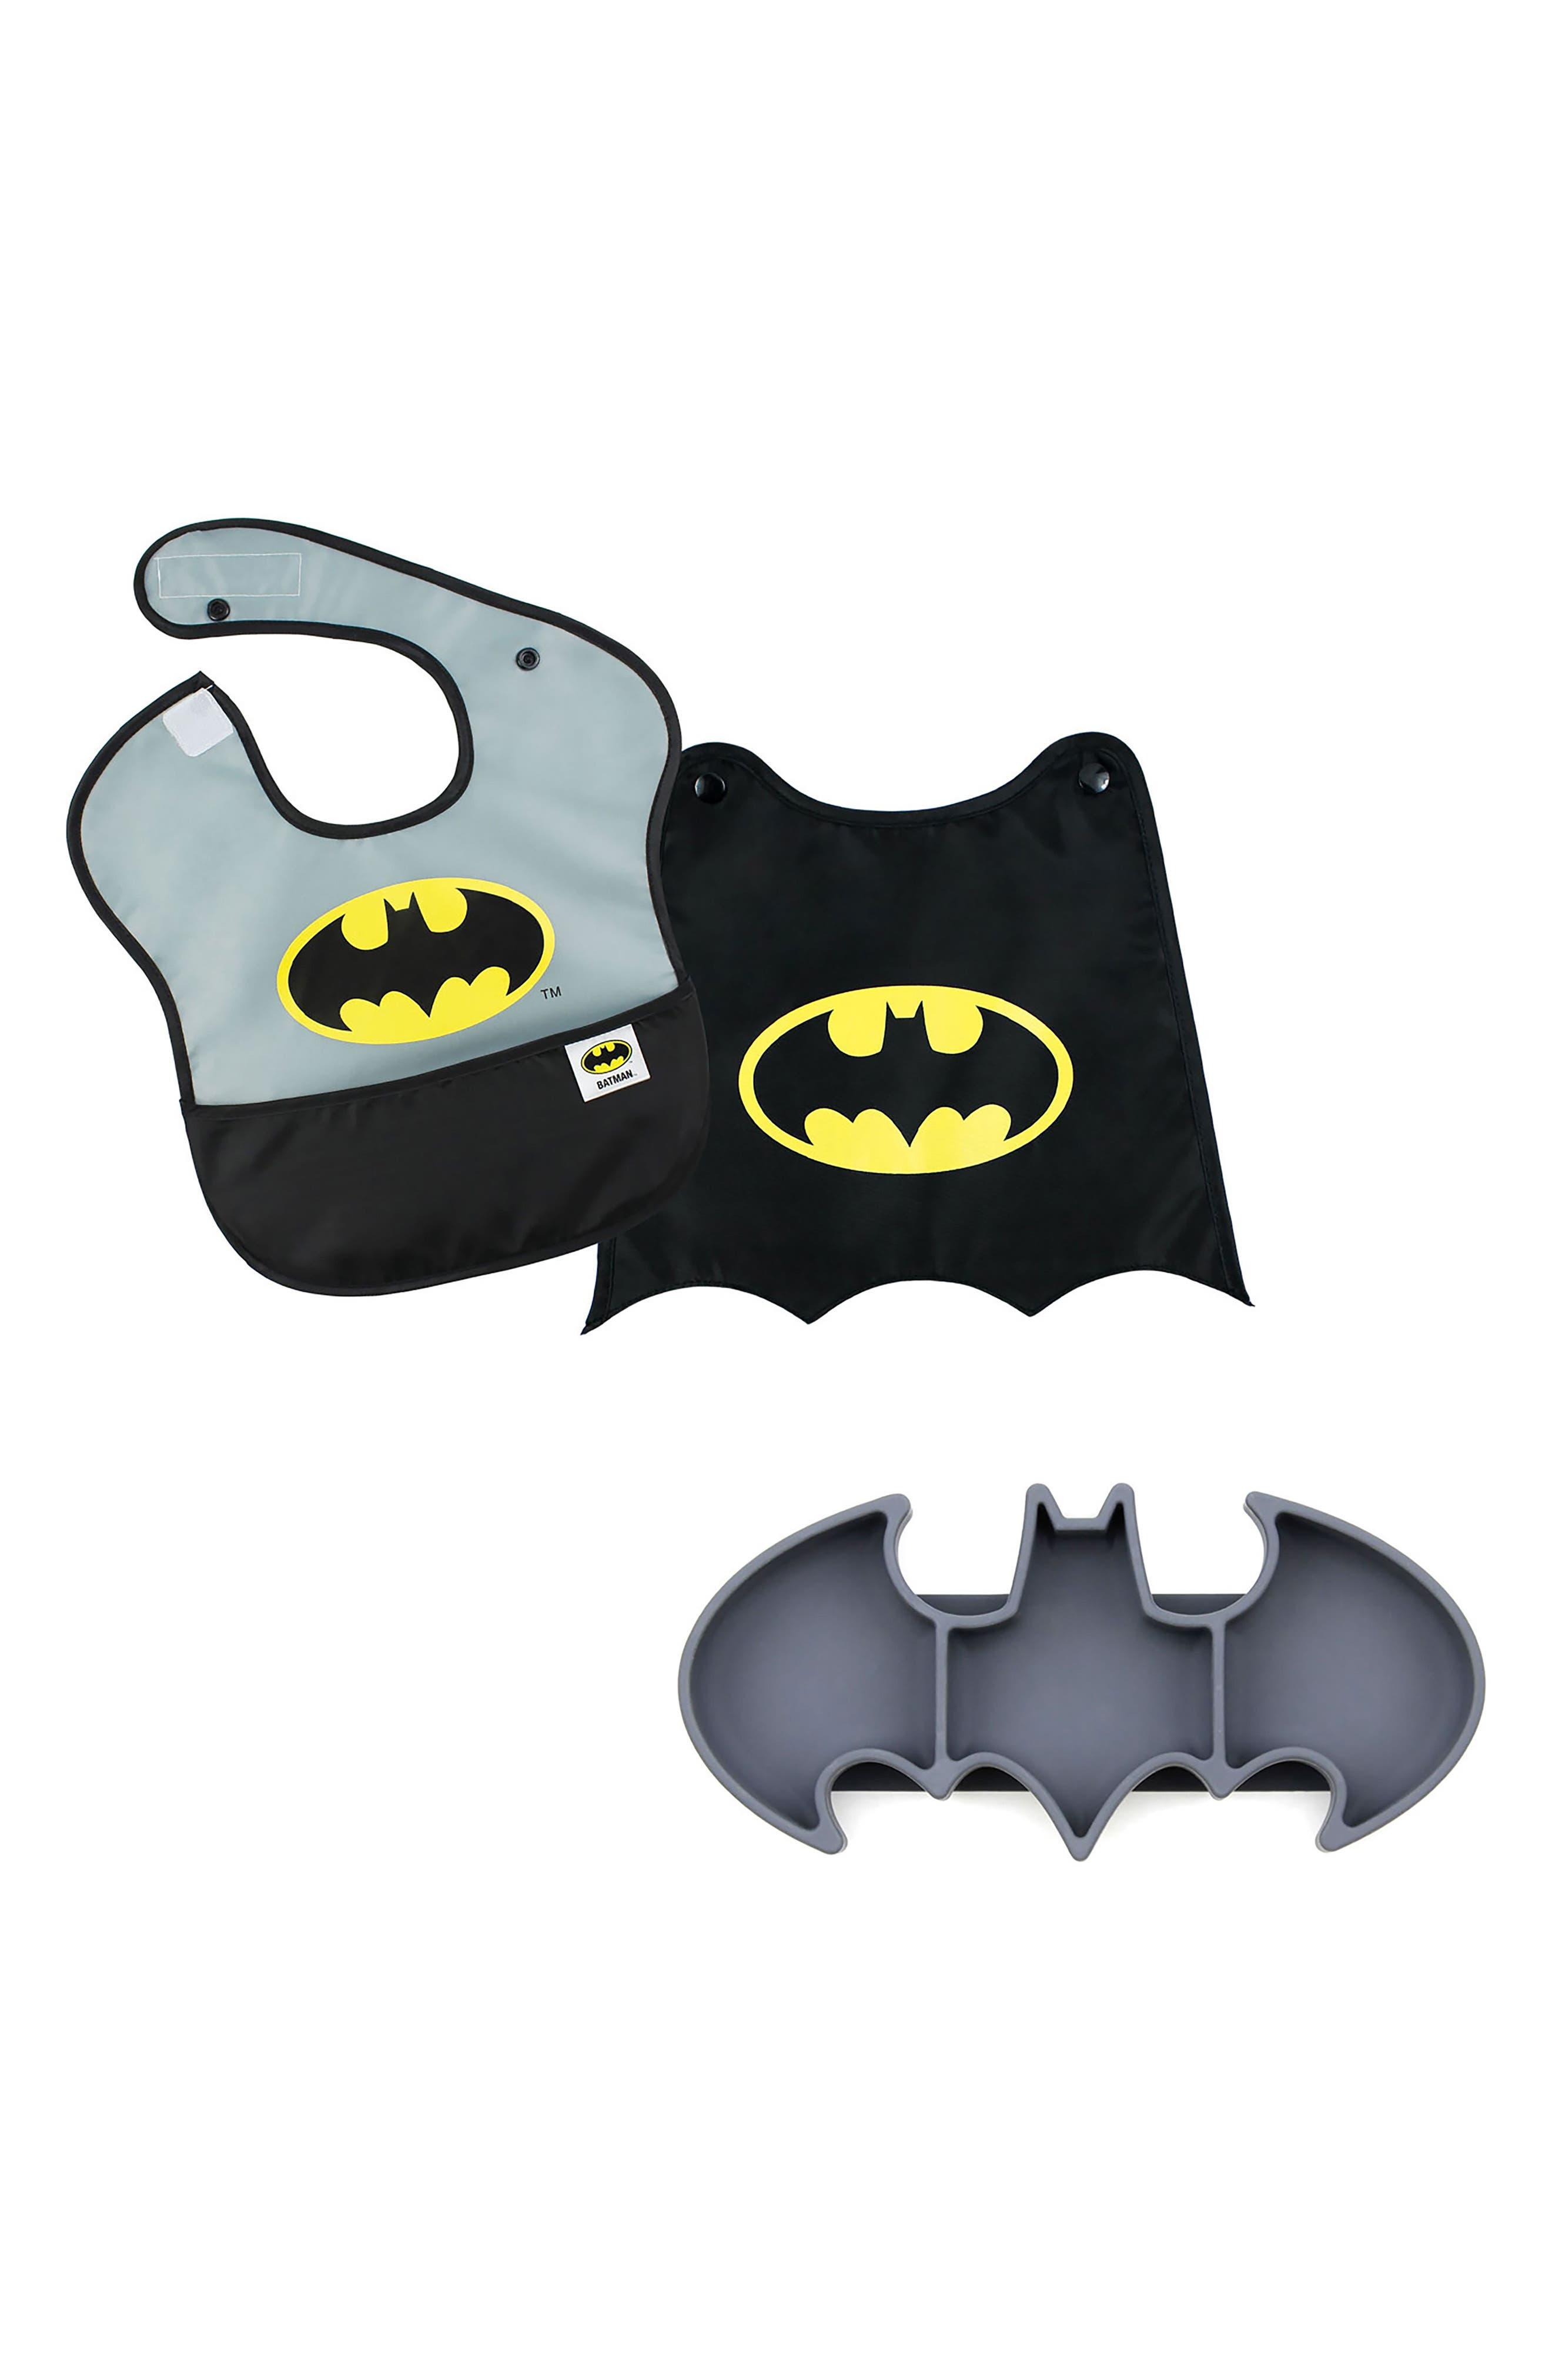 Alternate Image 1 Selected - Bumkins Batman Grip Dish & Caped SuperBib Set (Baby Boys)